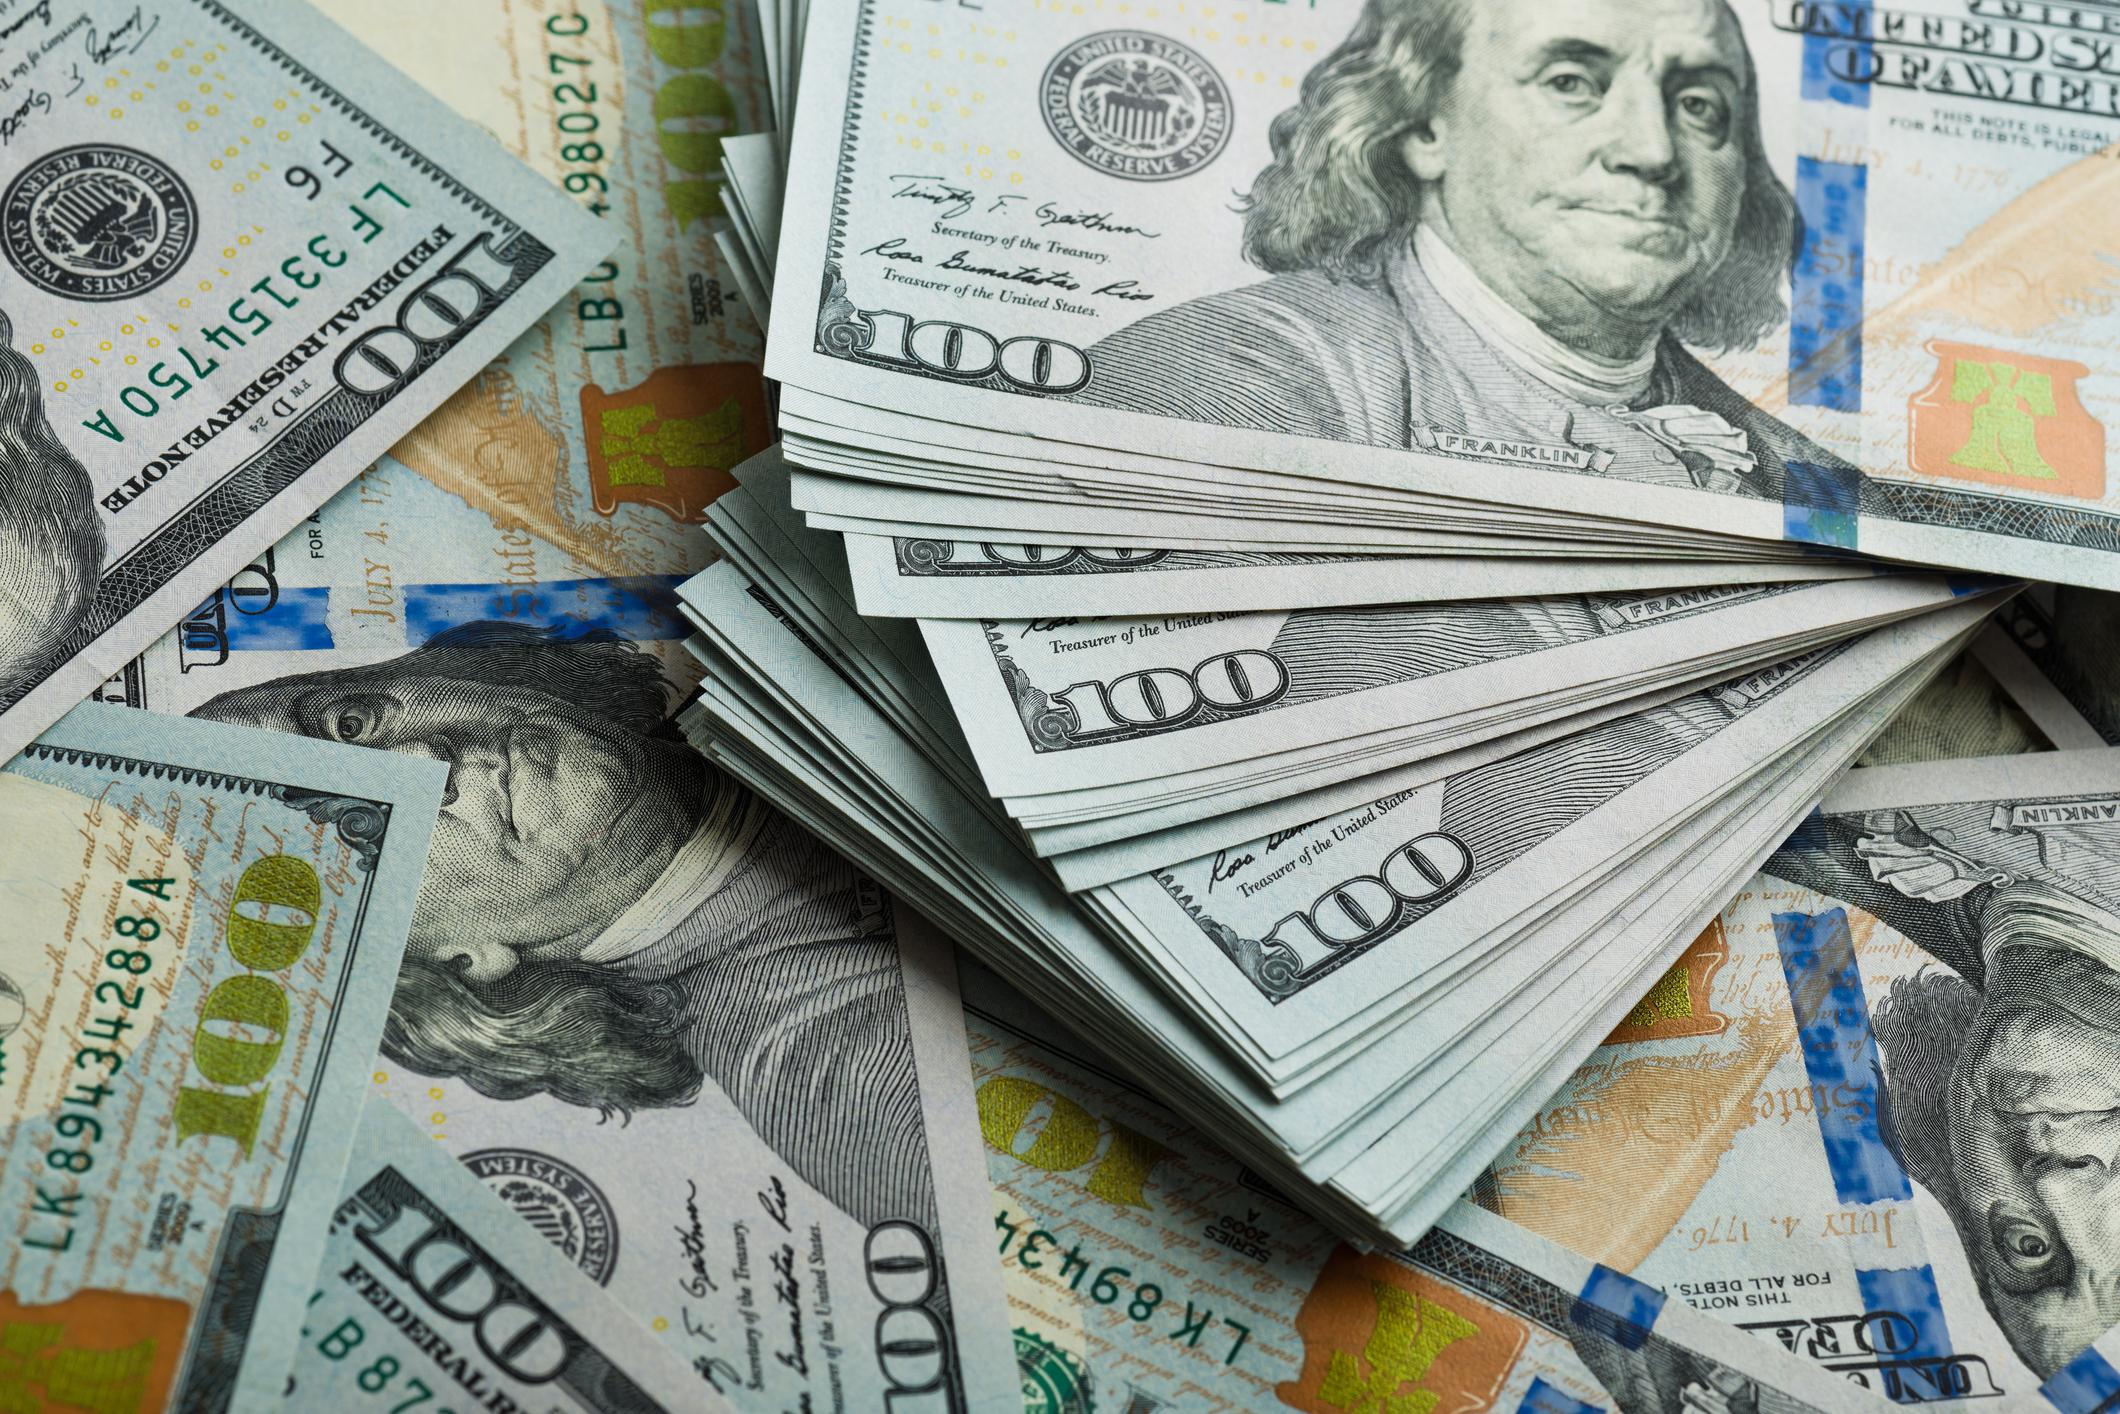 Stacks of money.